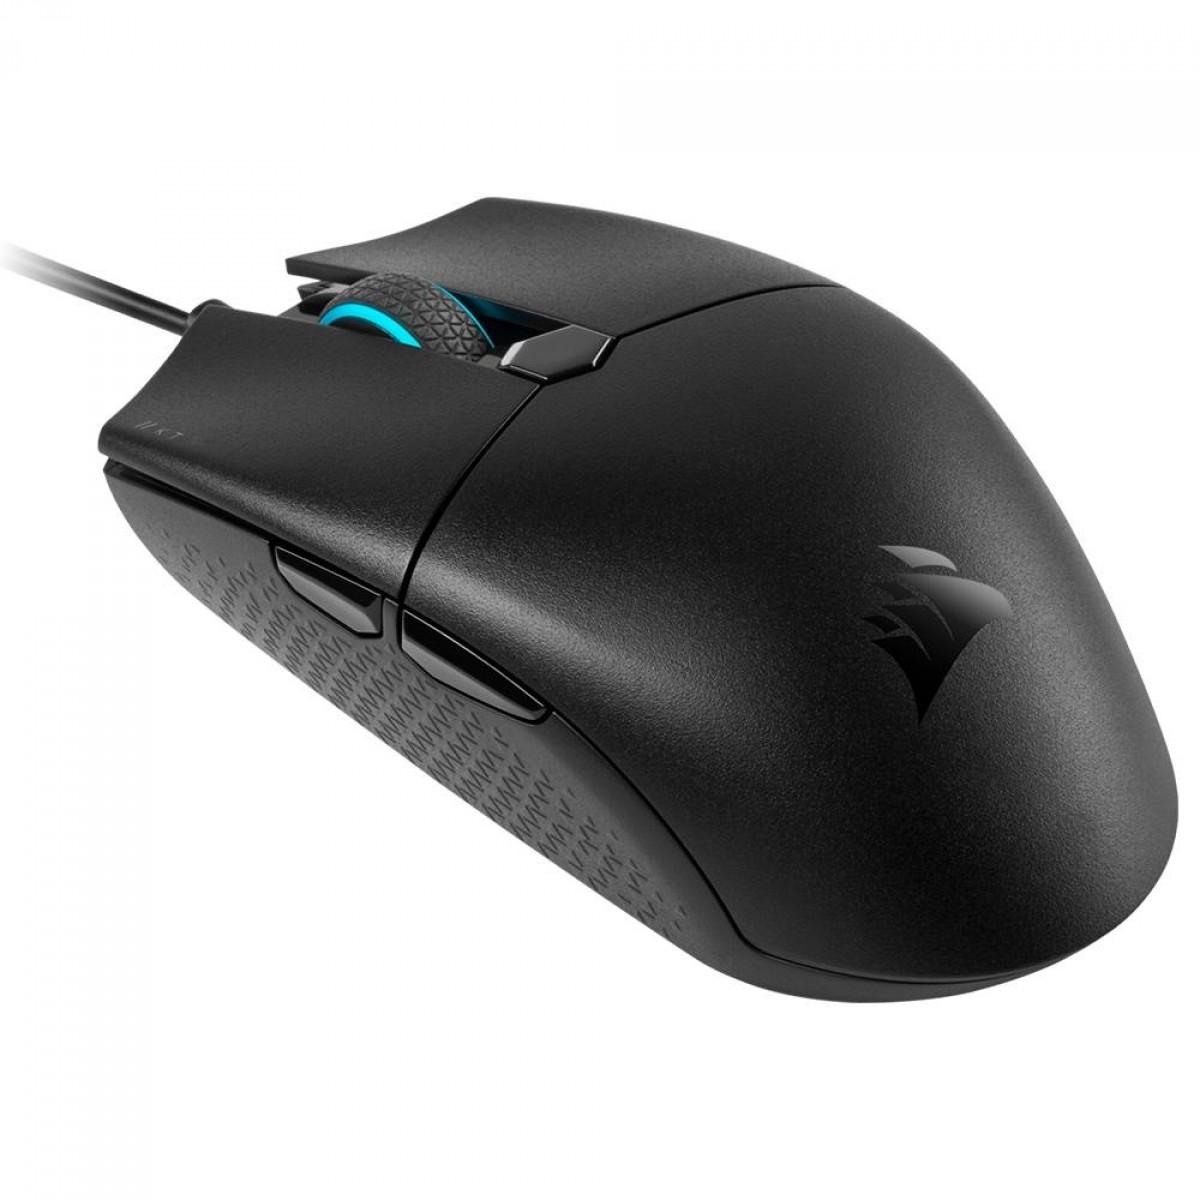 Mouse Gamer Corsair Katar Pro, 12400 DPI, 6 Botões, RGB, Black, CH-930C011-NA